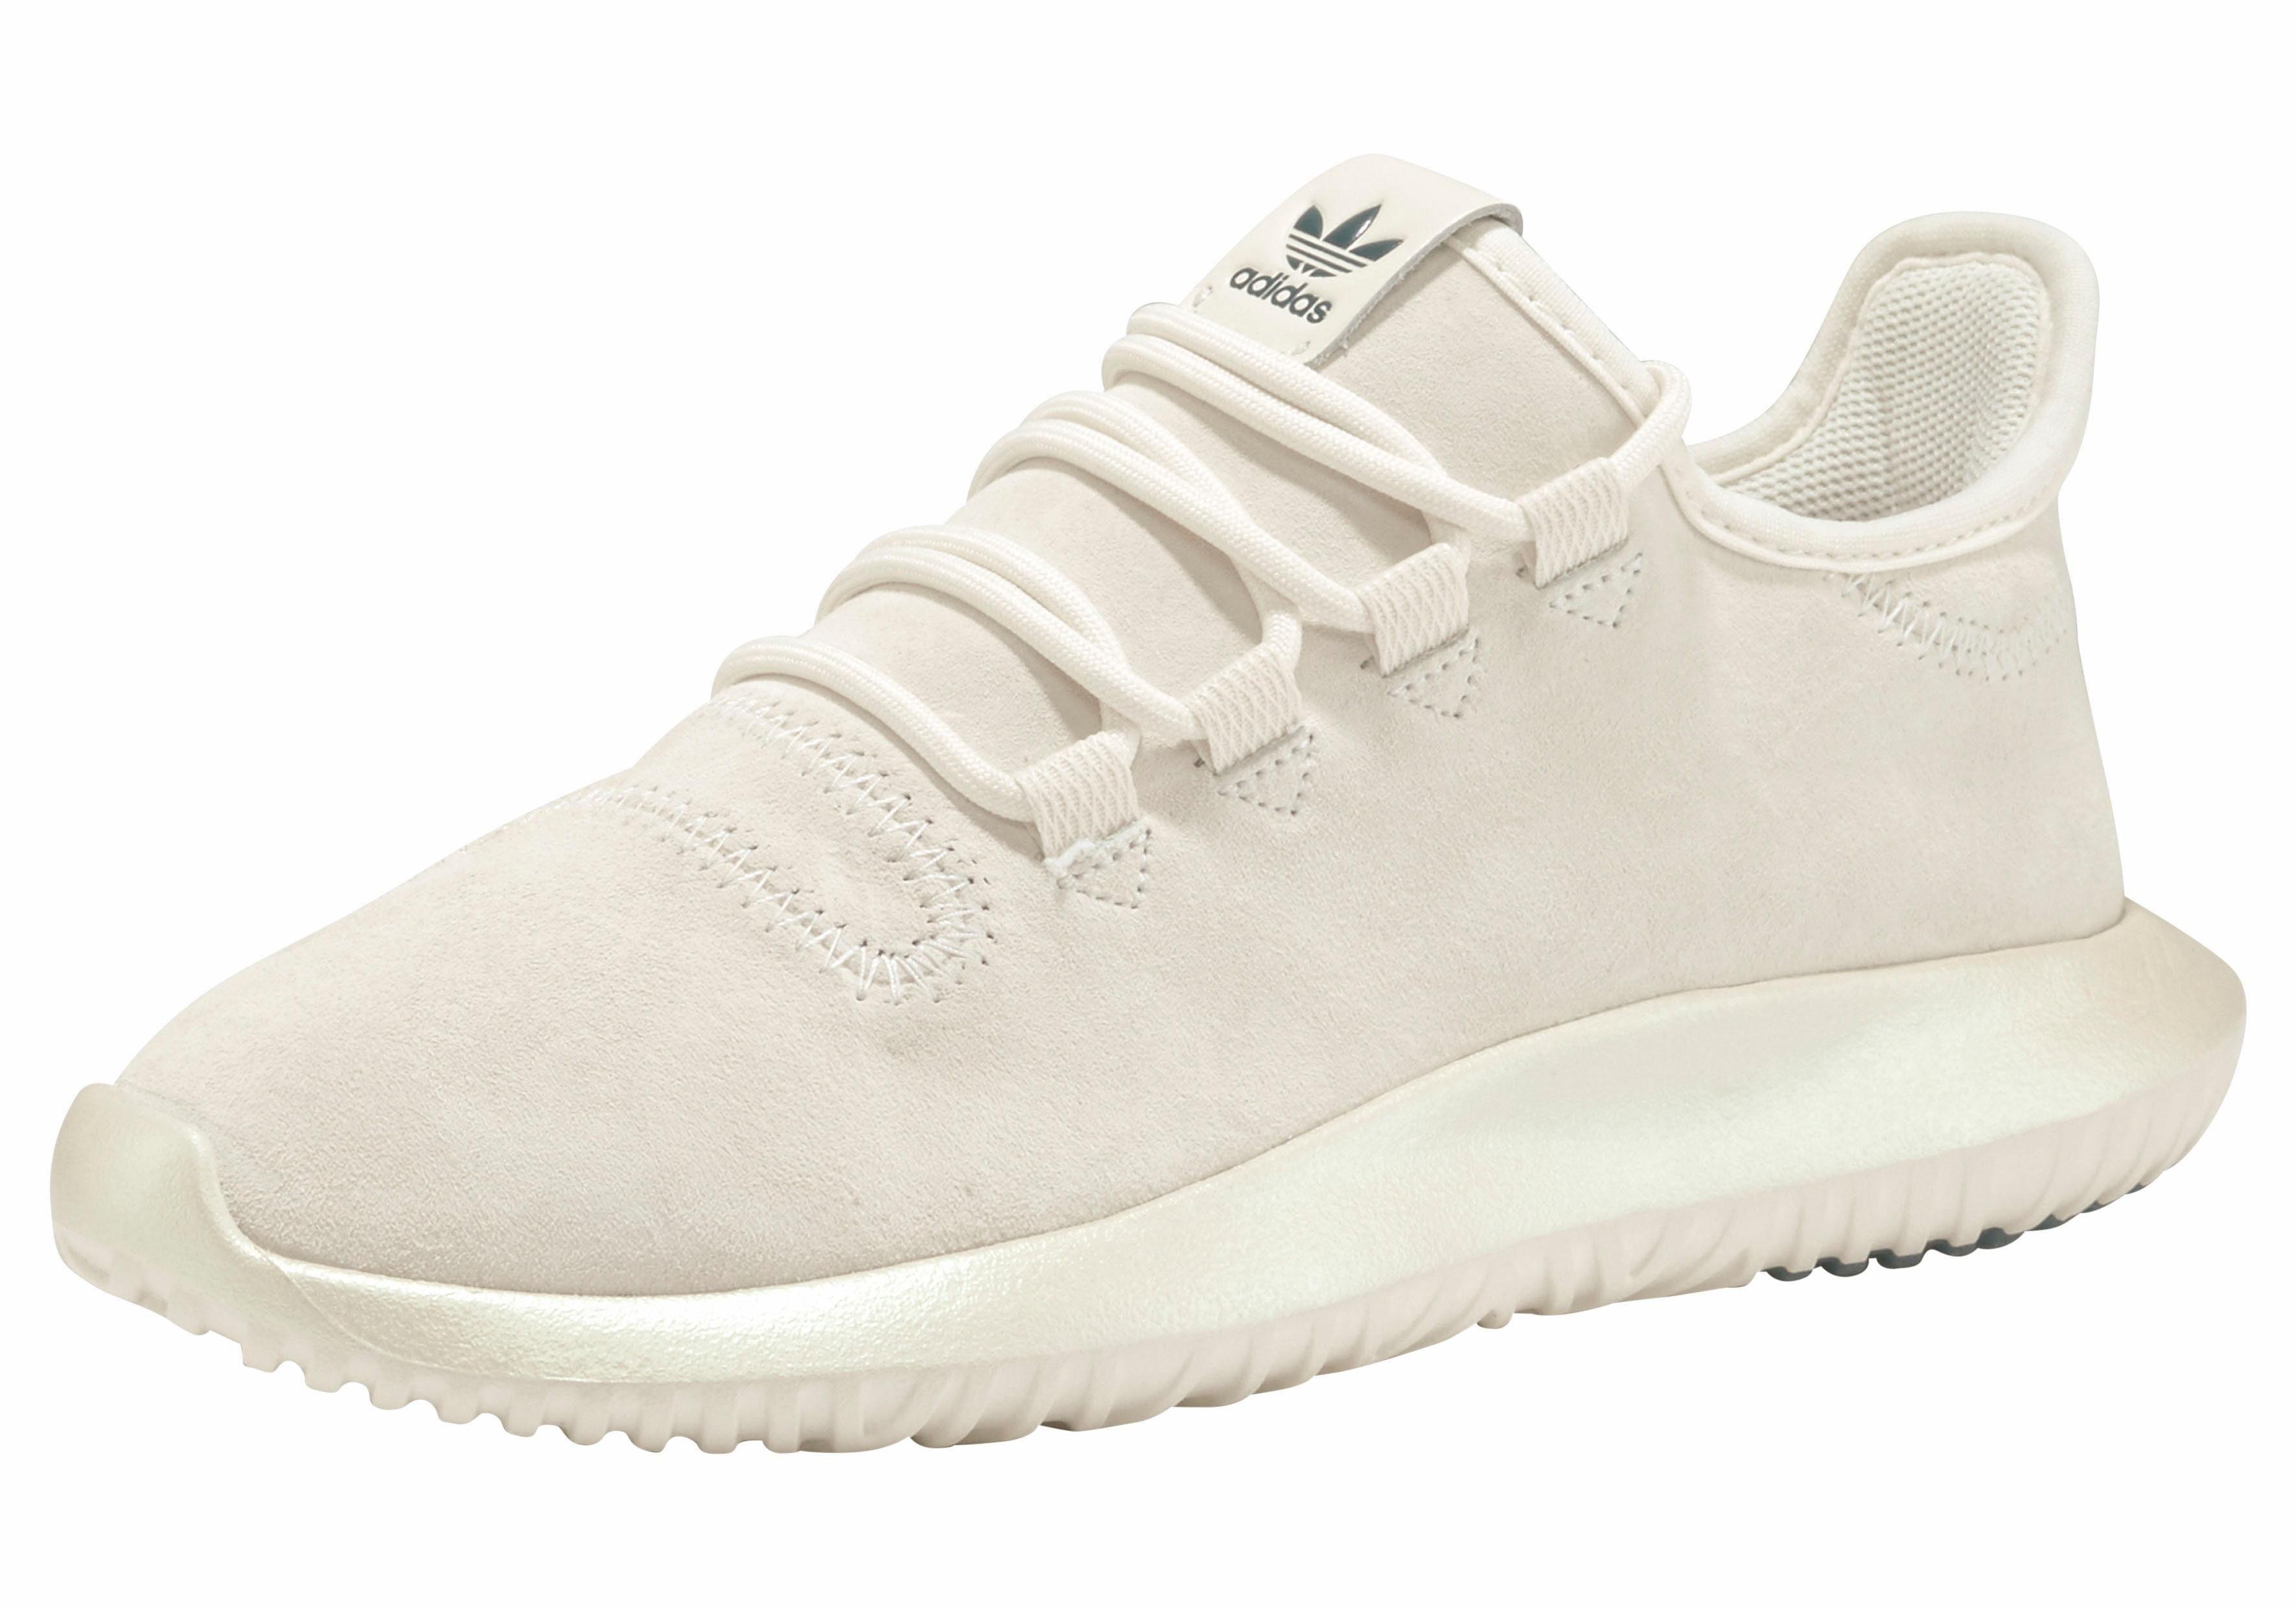 ADIDAS ORIGINALS TUBULAR Shadow Sneaker WeißCreme NEU Schuhe Turnschuhe